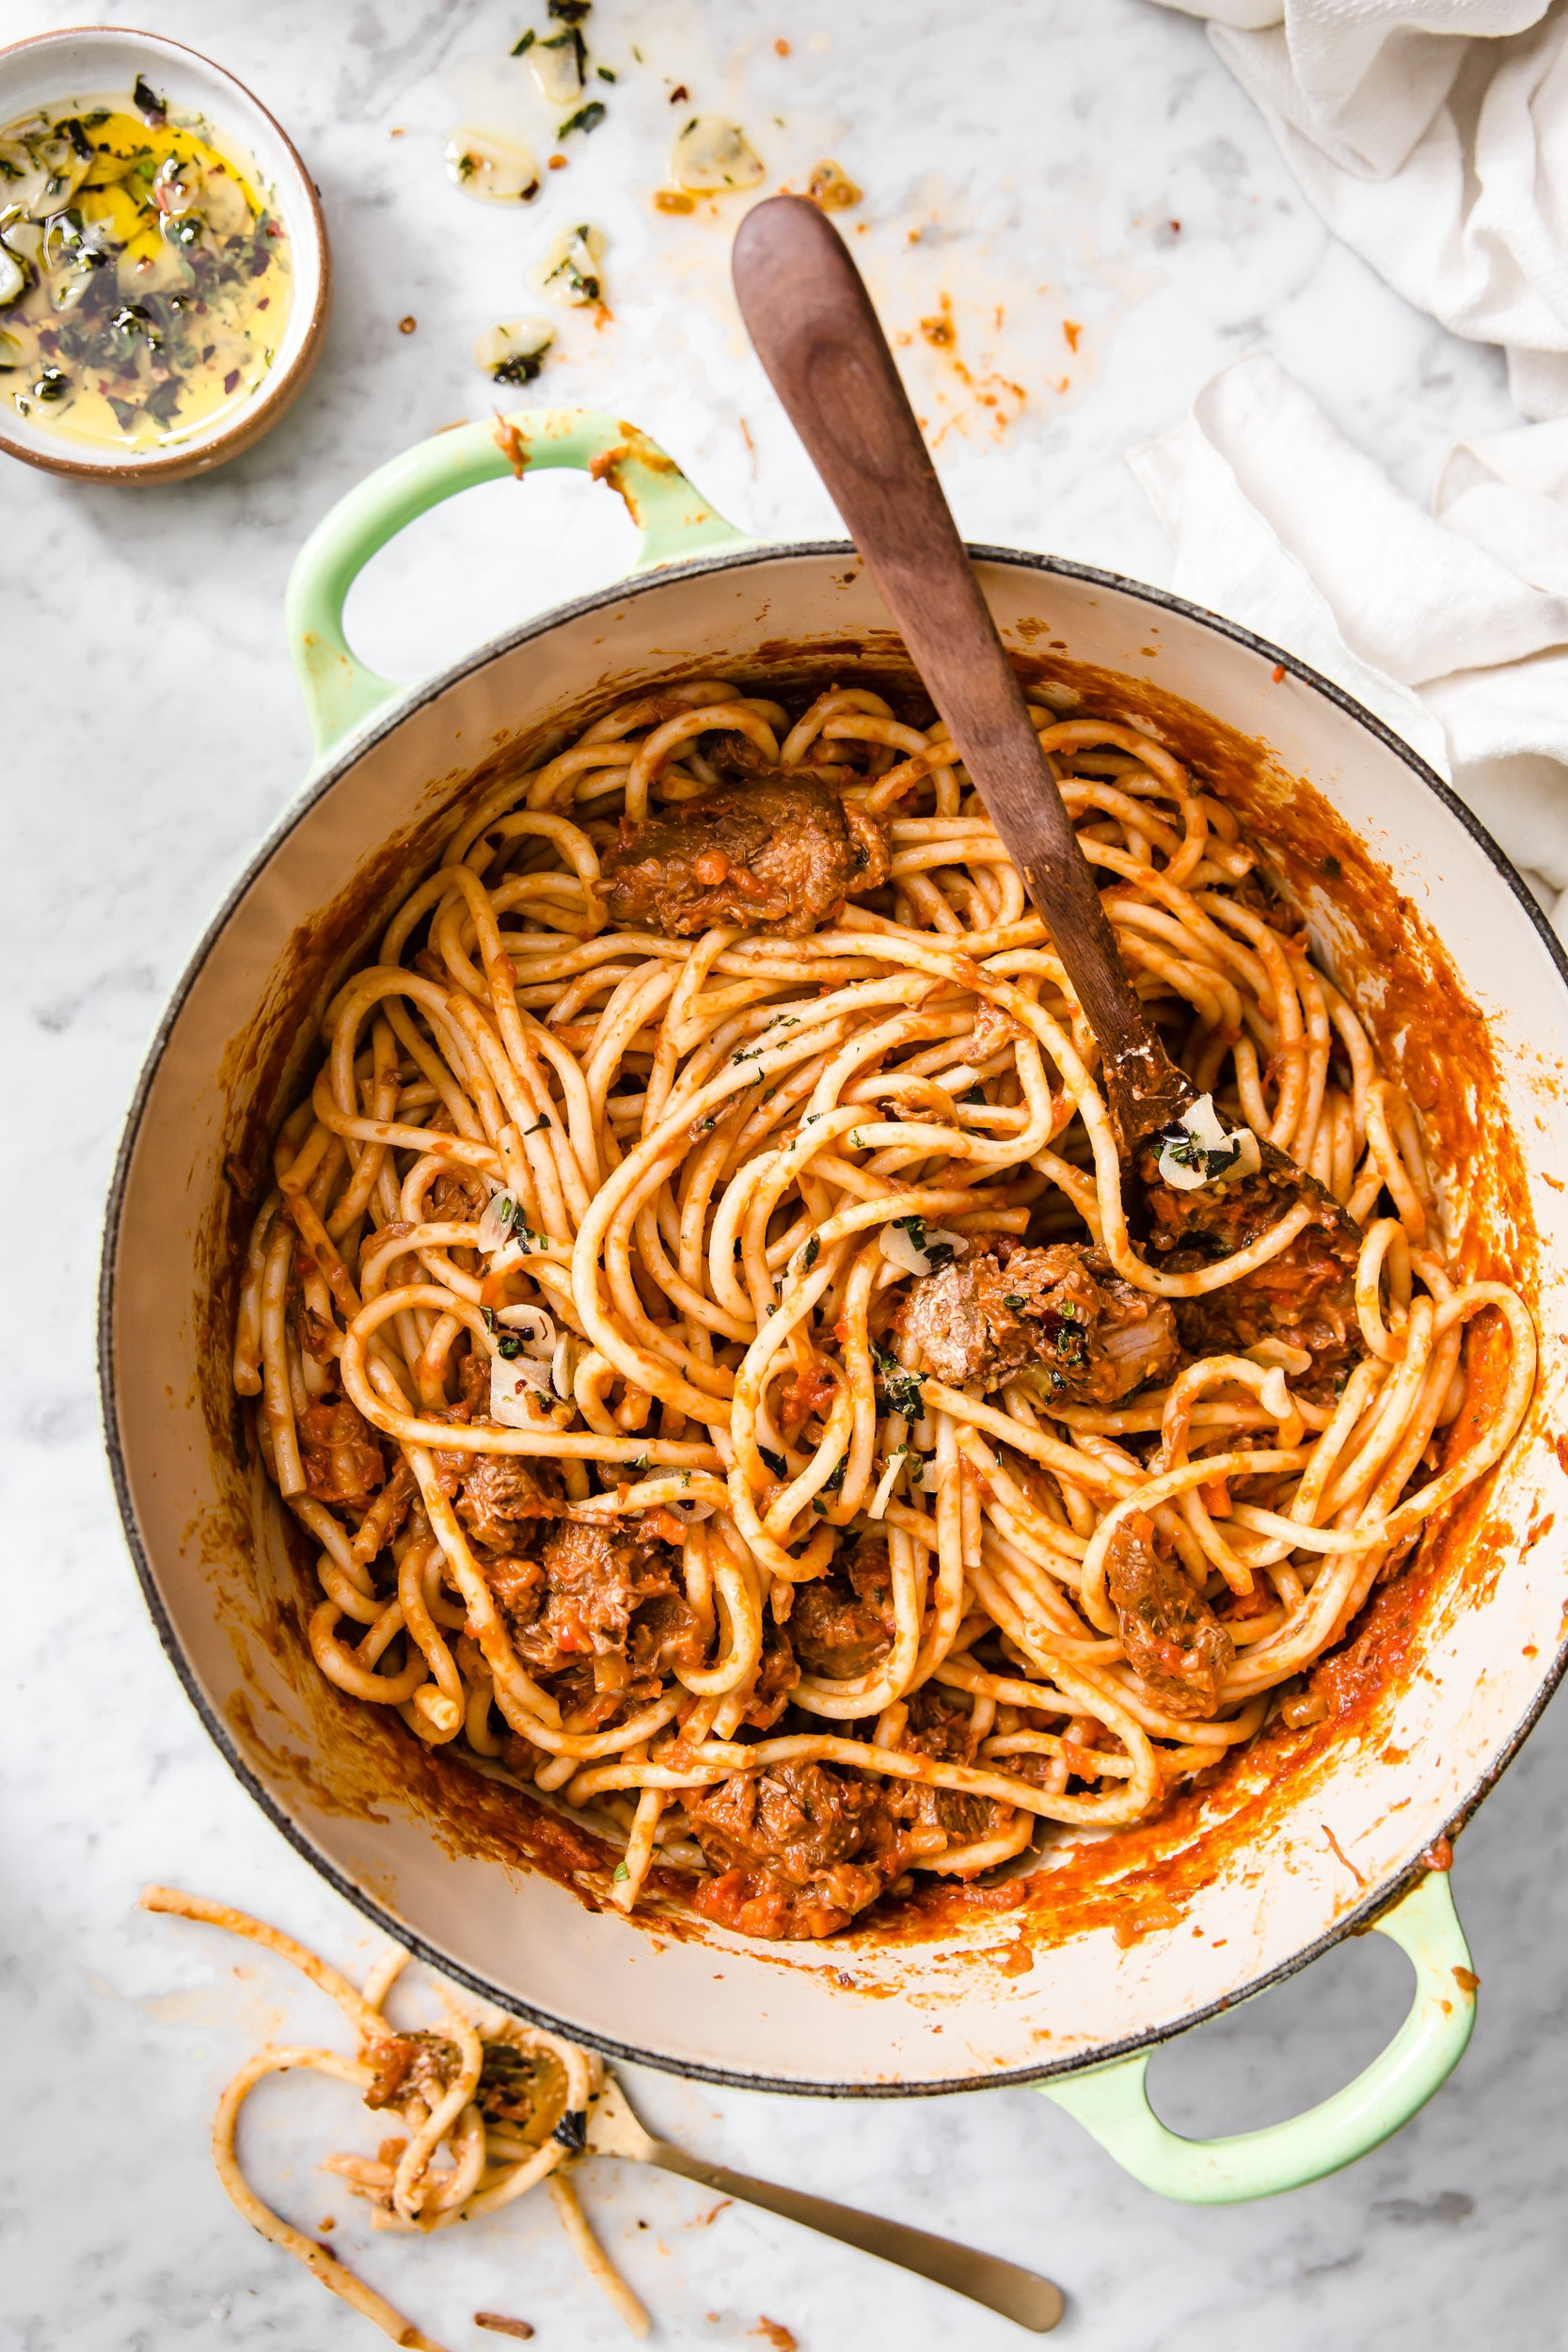 Bucatini+with+Lamb+Ragu+James+Beard+Food+Stylist+Judy+Kim